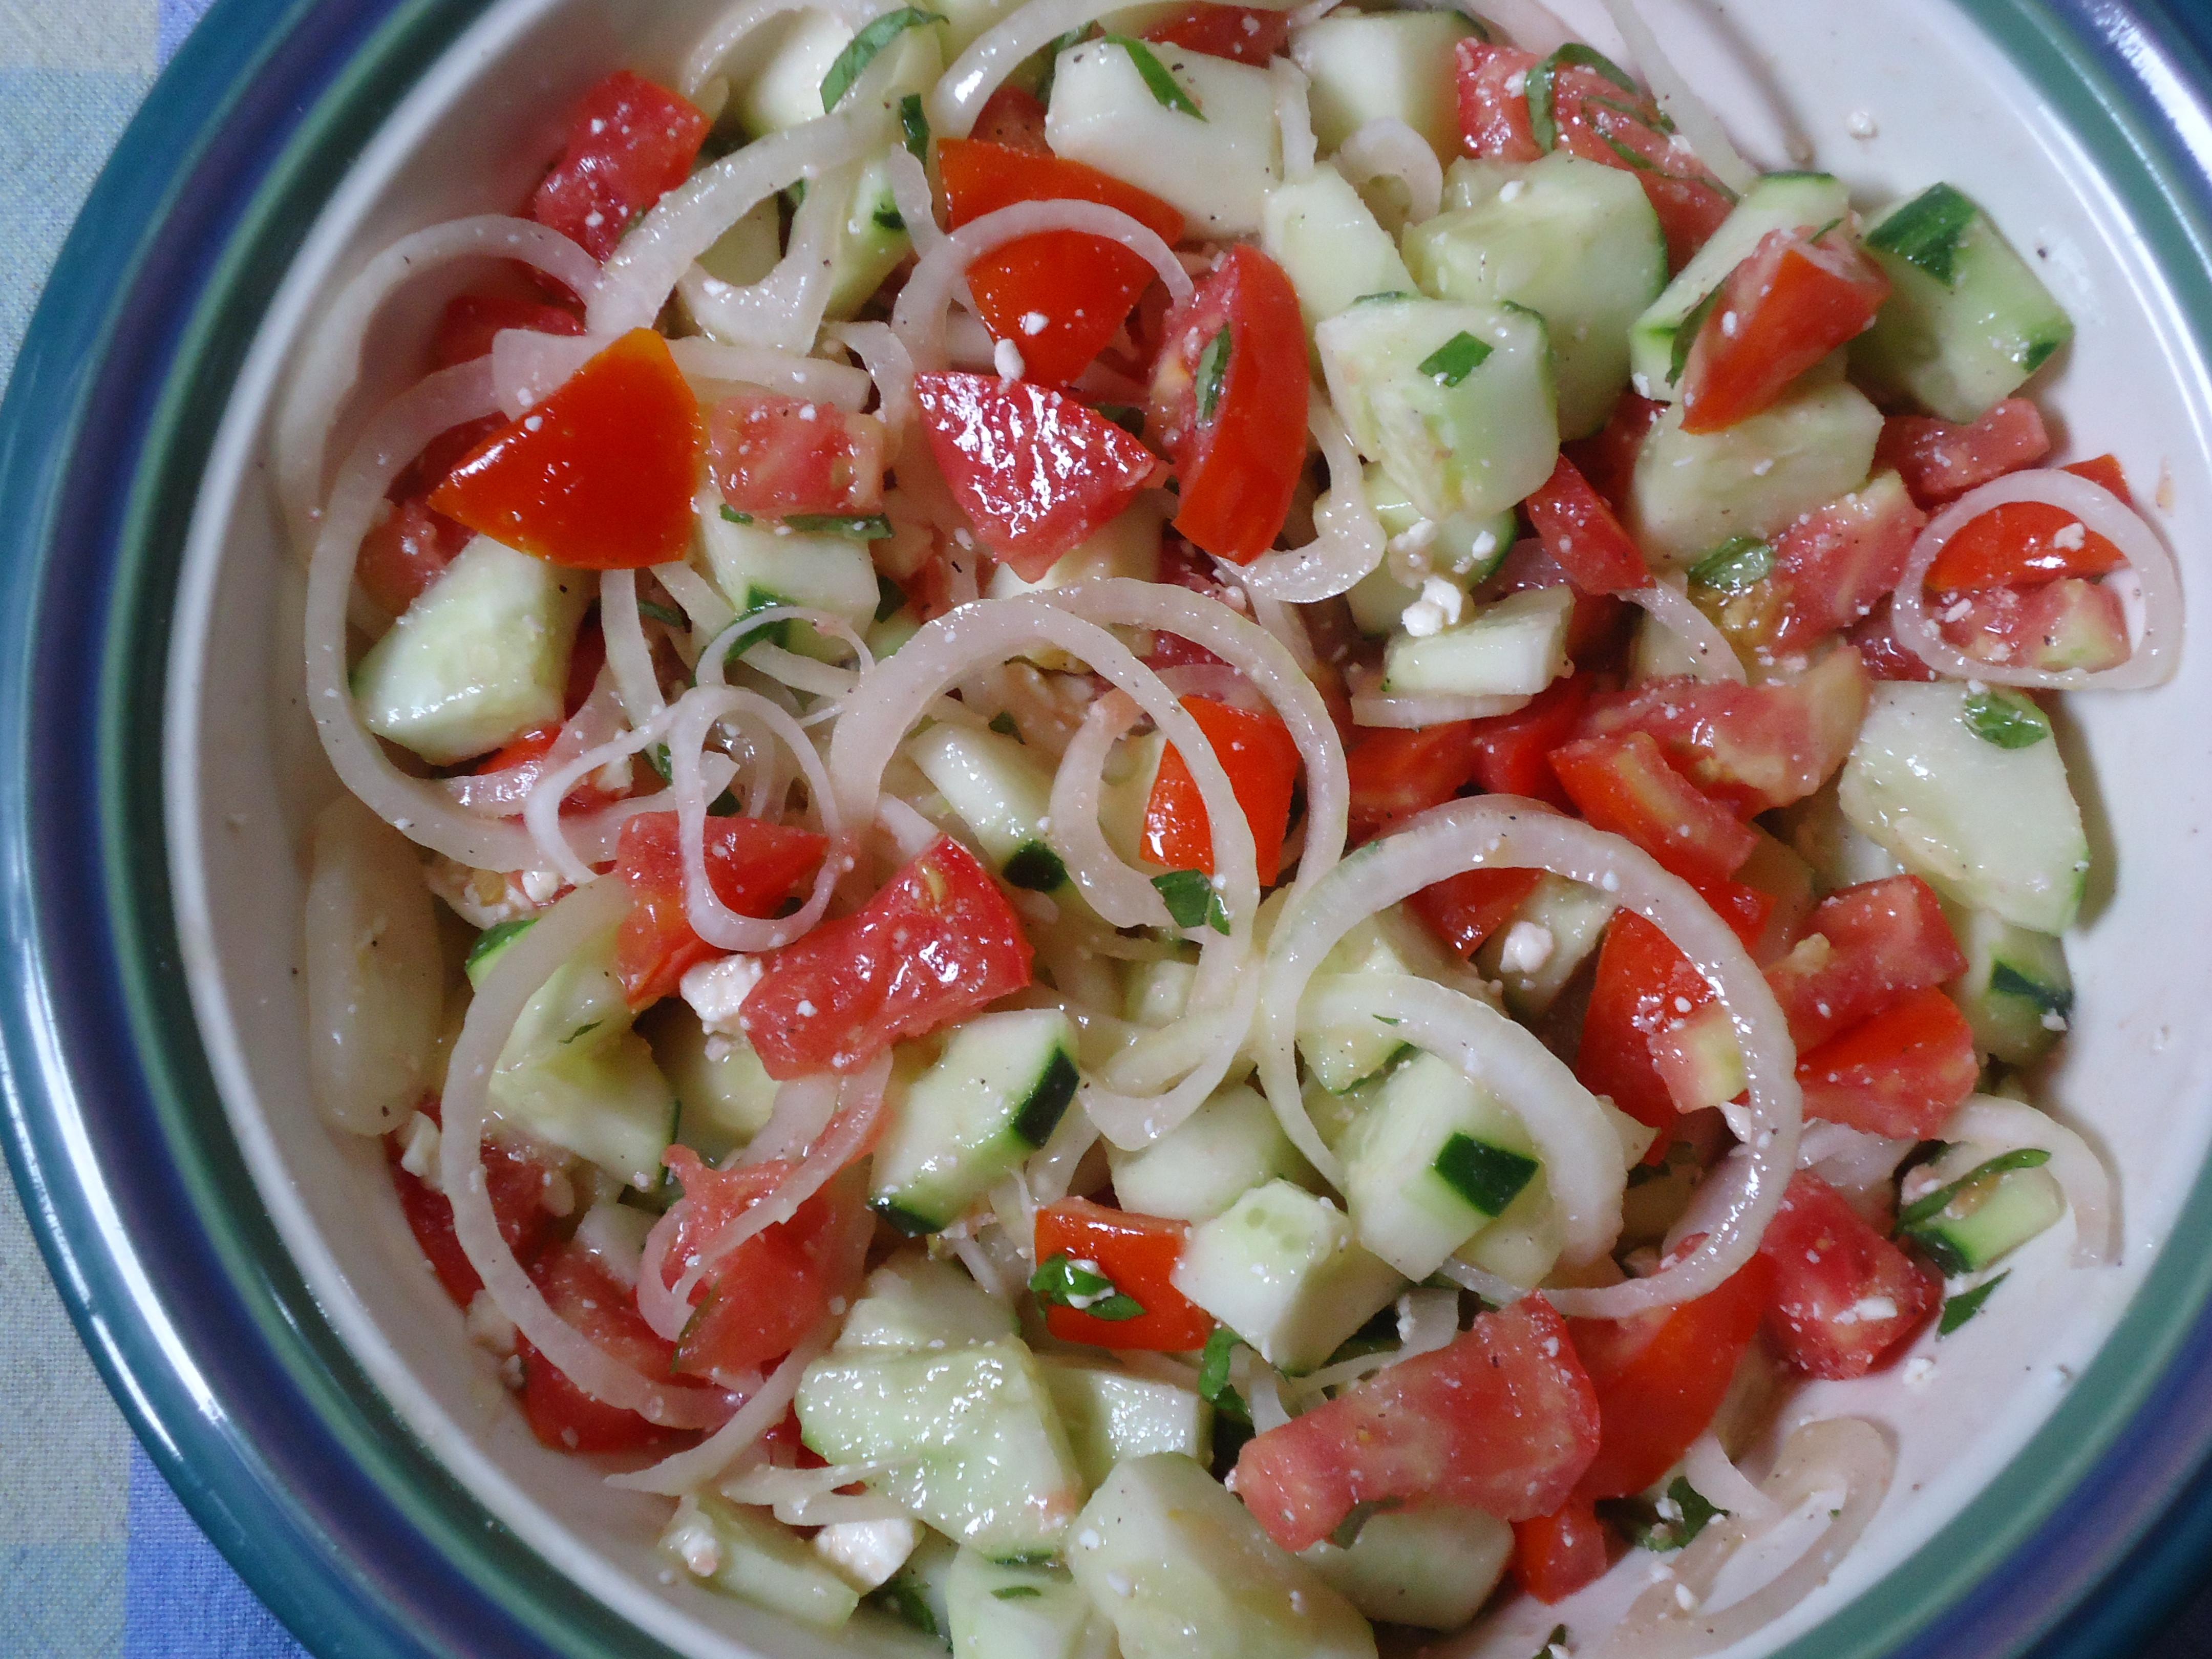 Tomato Onion Salad  Tomato Cucumber and ion Salad